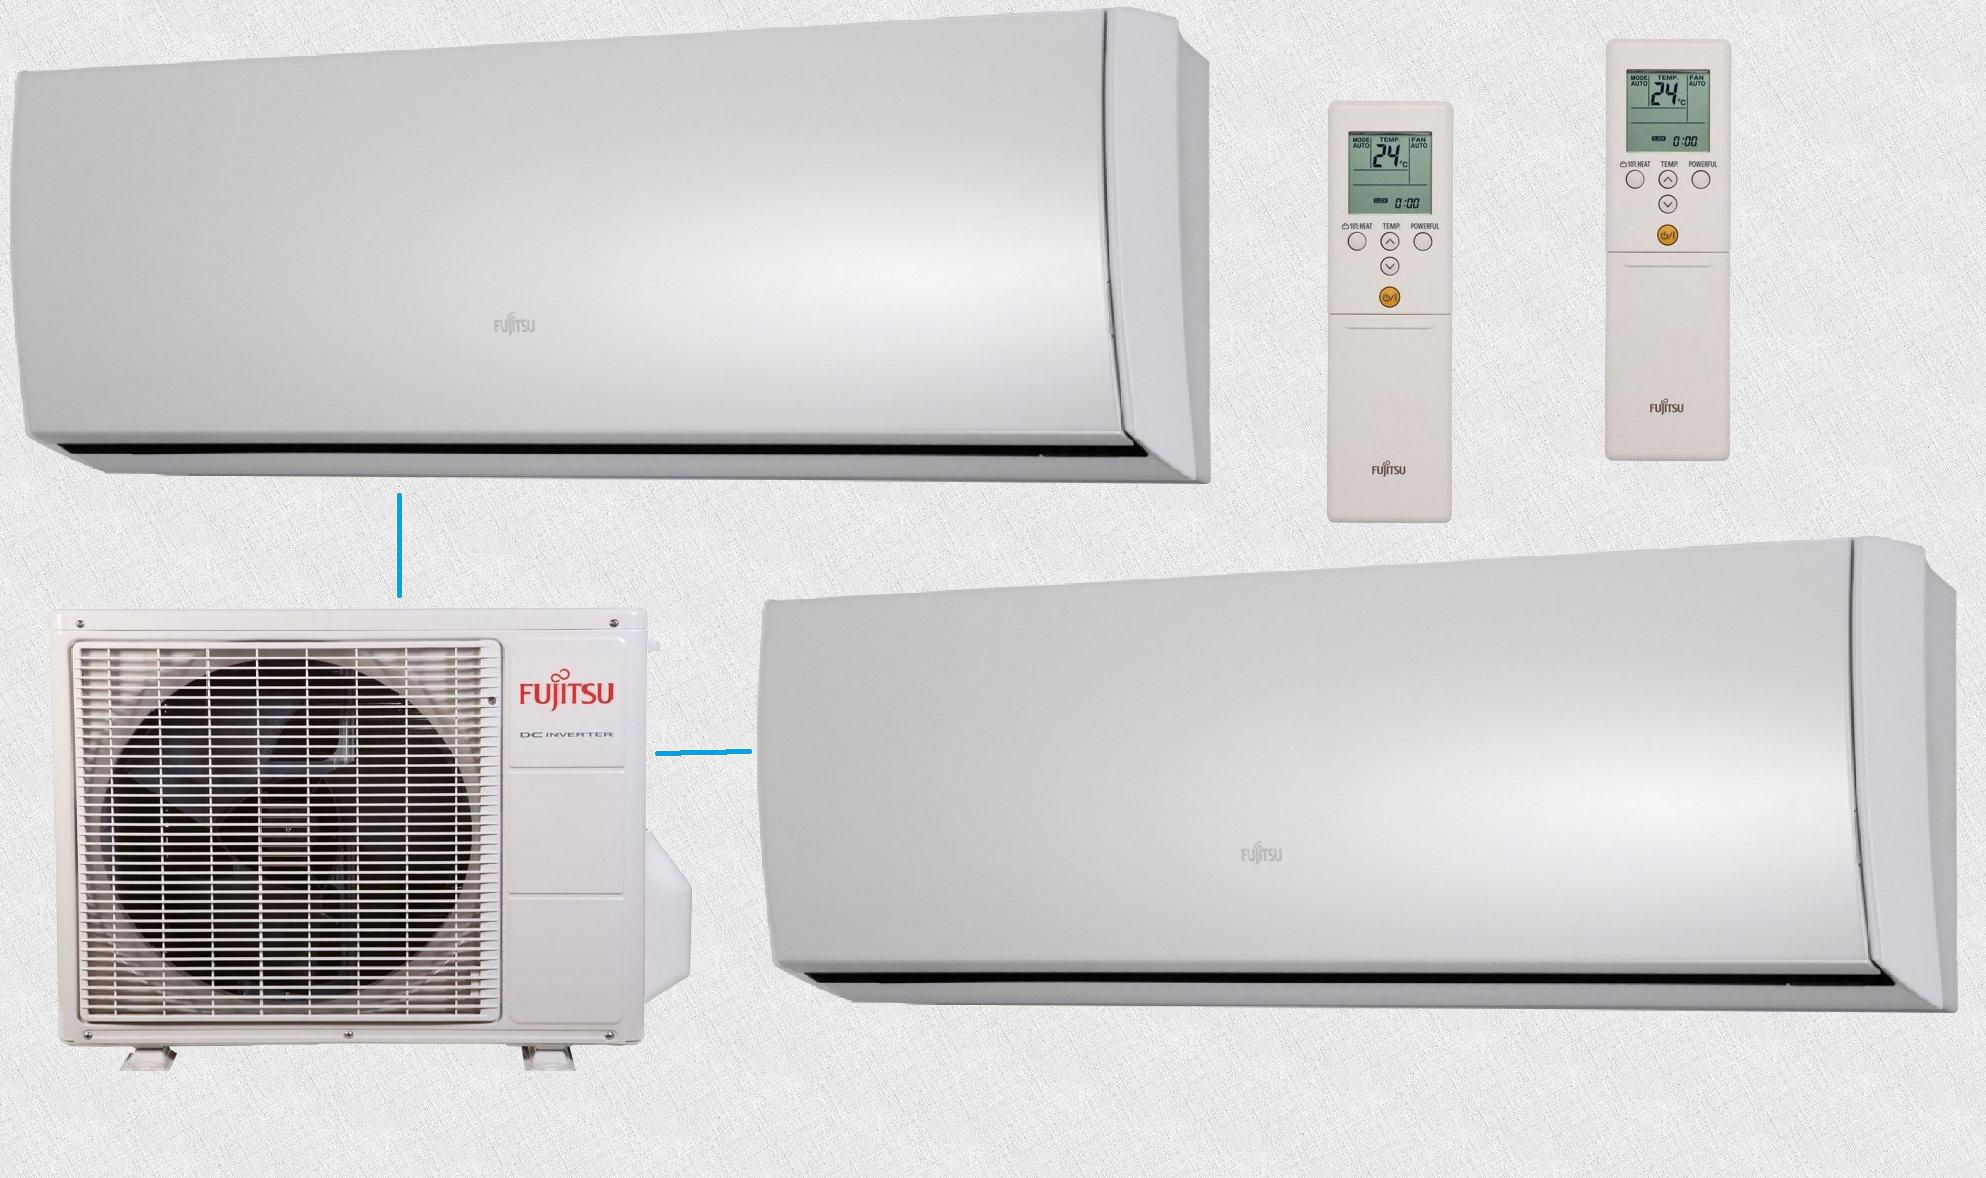 Fujitsu на 2 комнаты AOYG14LAC2 / ASYG07LUCA